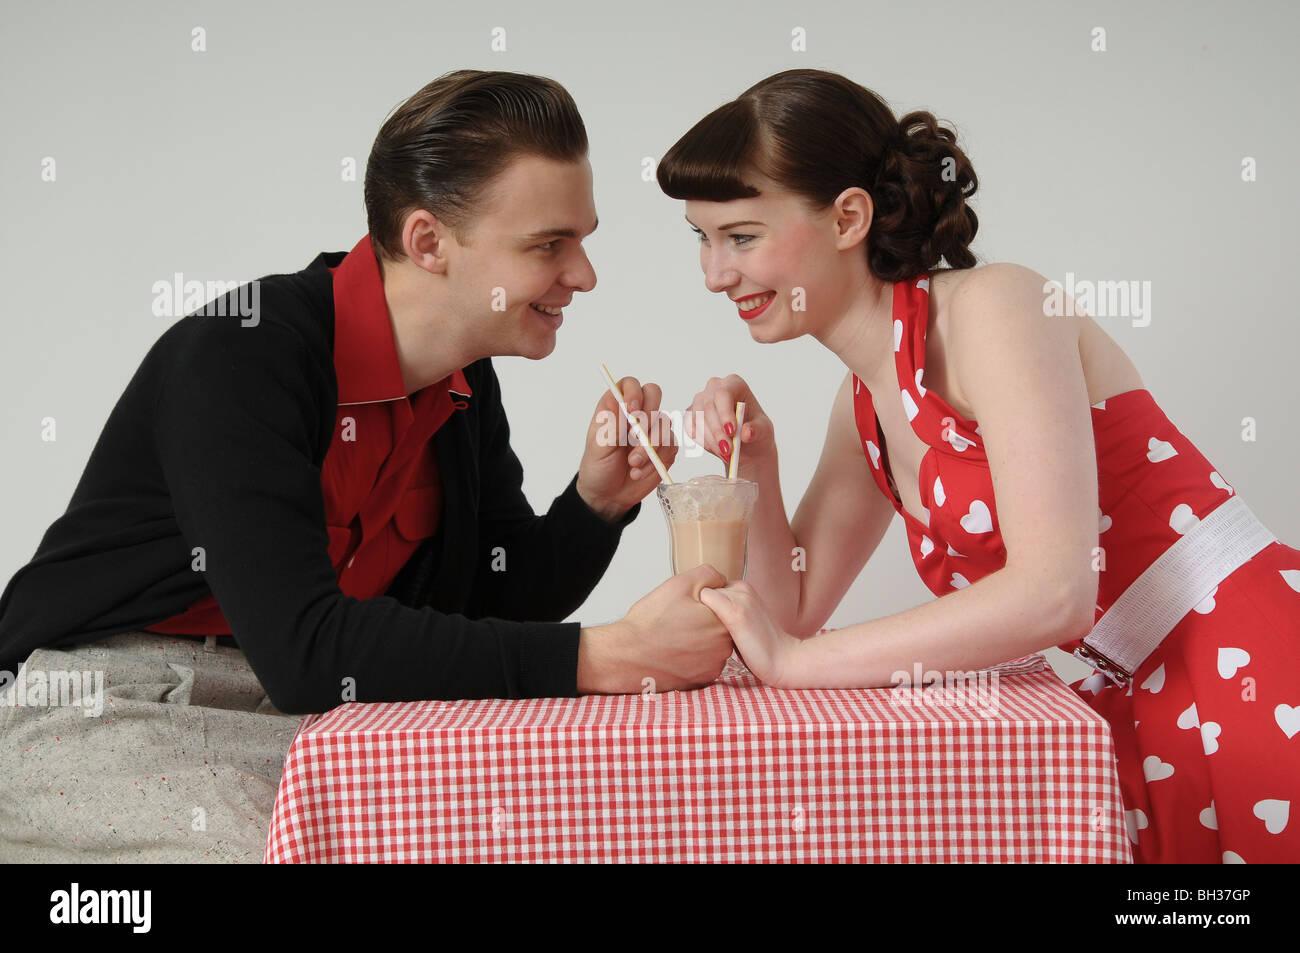 Couple sharing a milkshake in 1950s diner - Stock Image